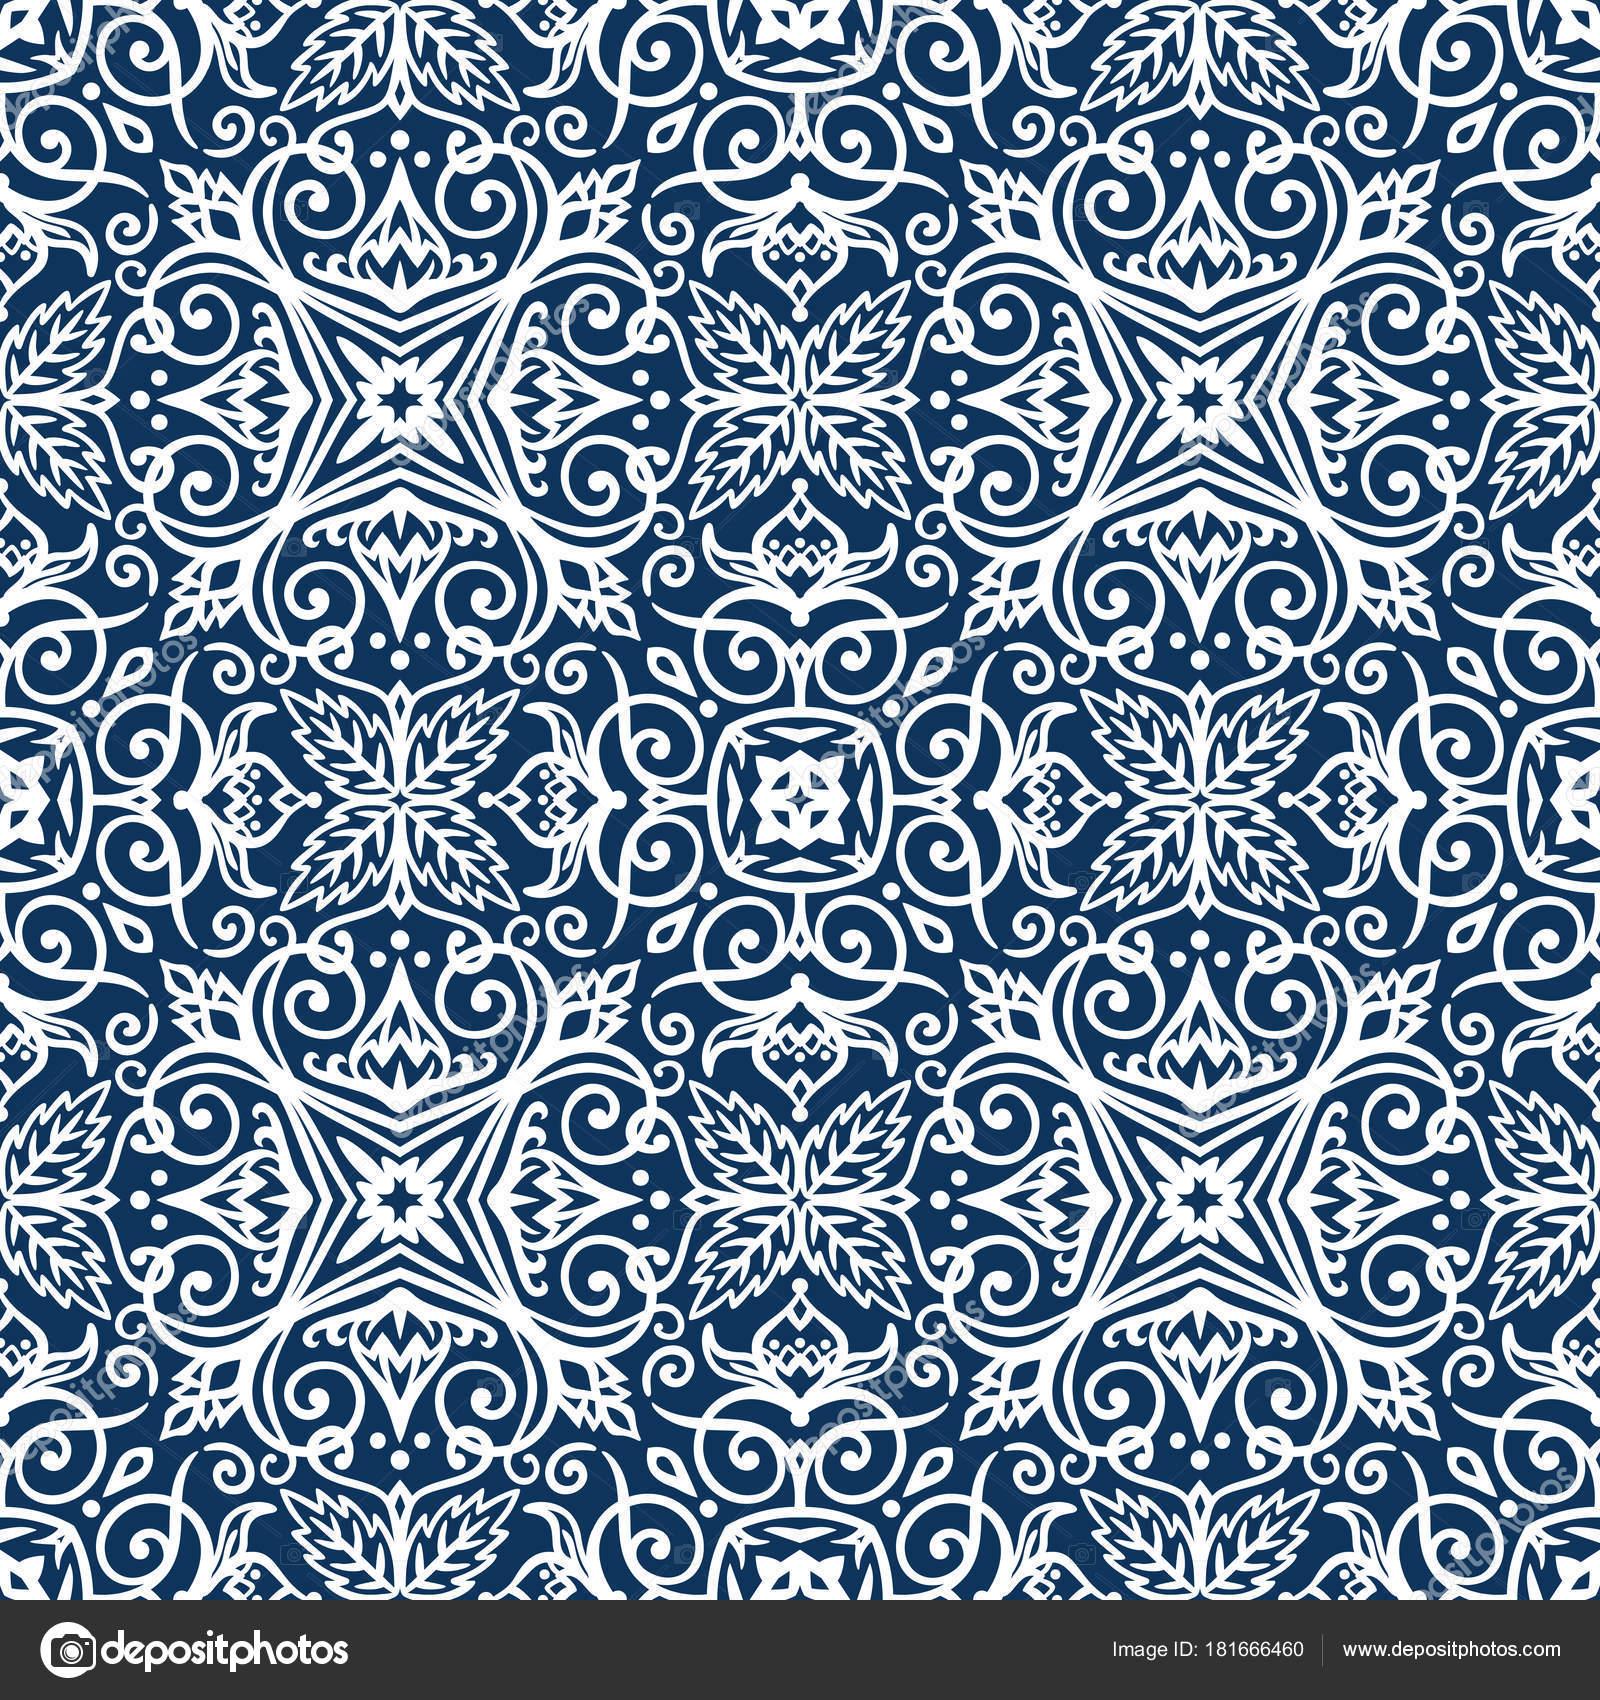 mod le arabesque bleue image vectorielle amovitania 181666460. Black Bedroom Furniture Sets. Home Design Ideas